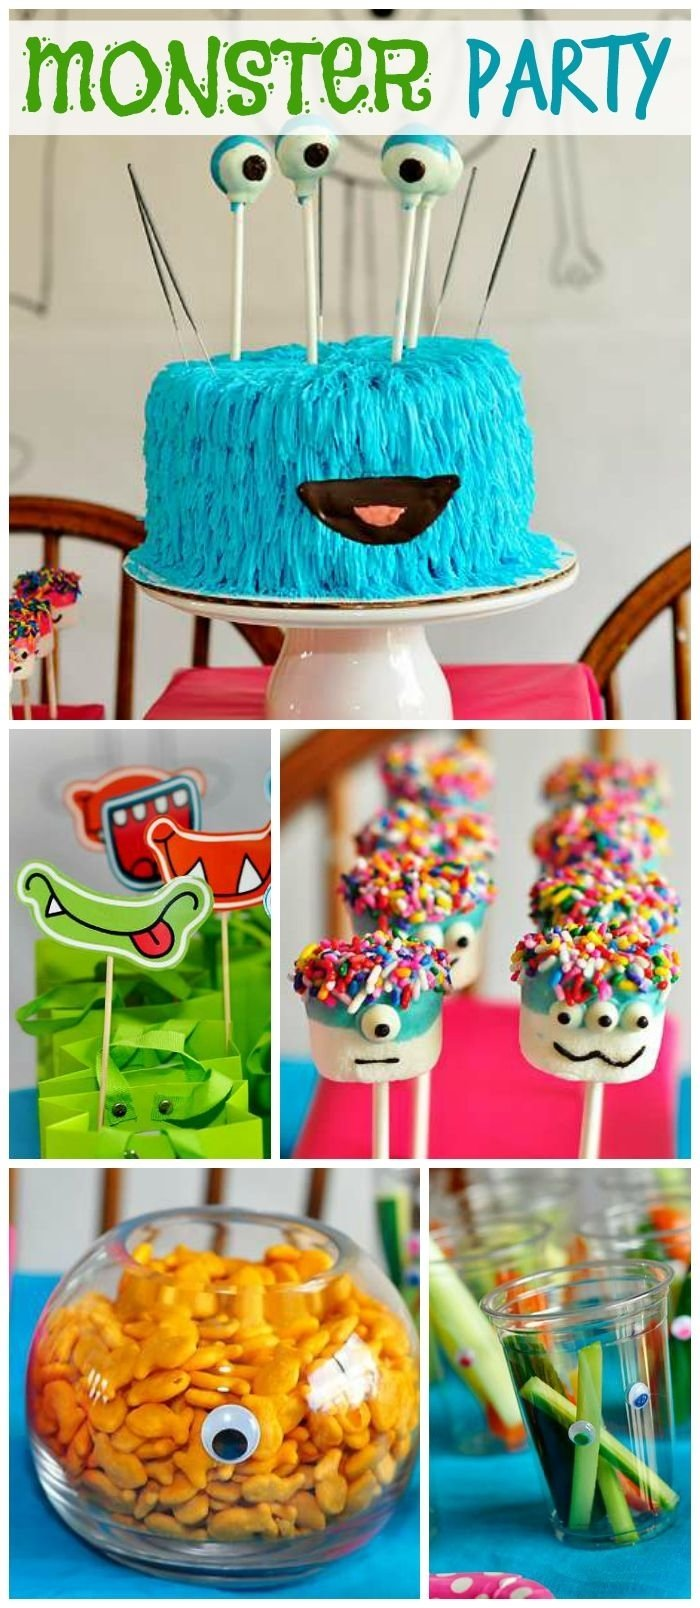 10 Pretty Fun Birthday Ideas For Kids 212 best monster party ideas images on pinterest monster party 2